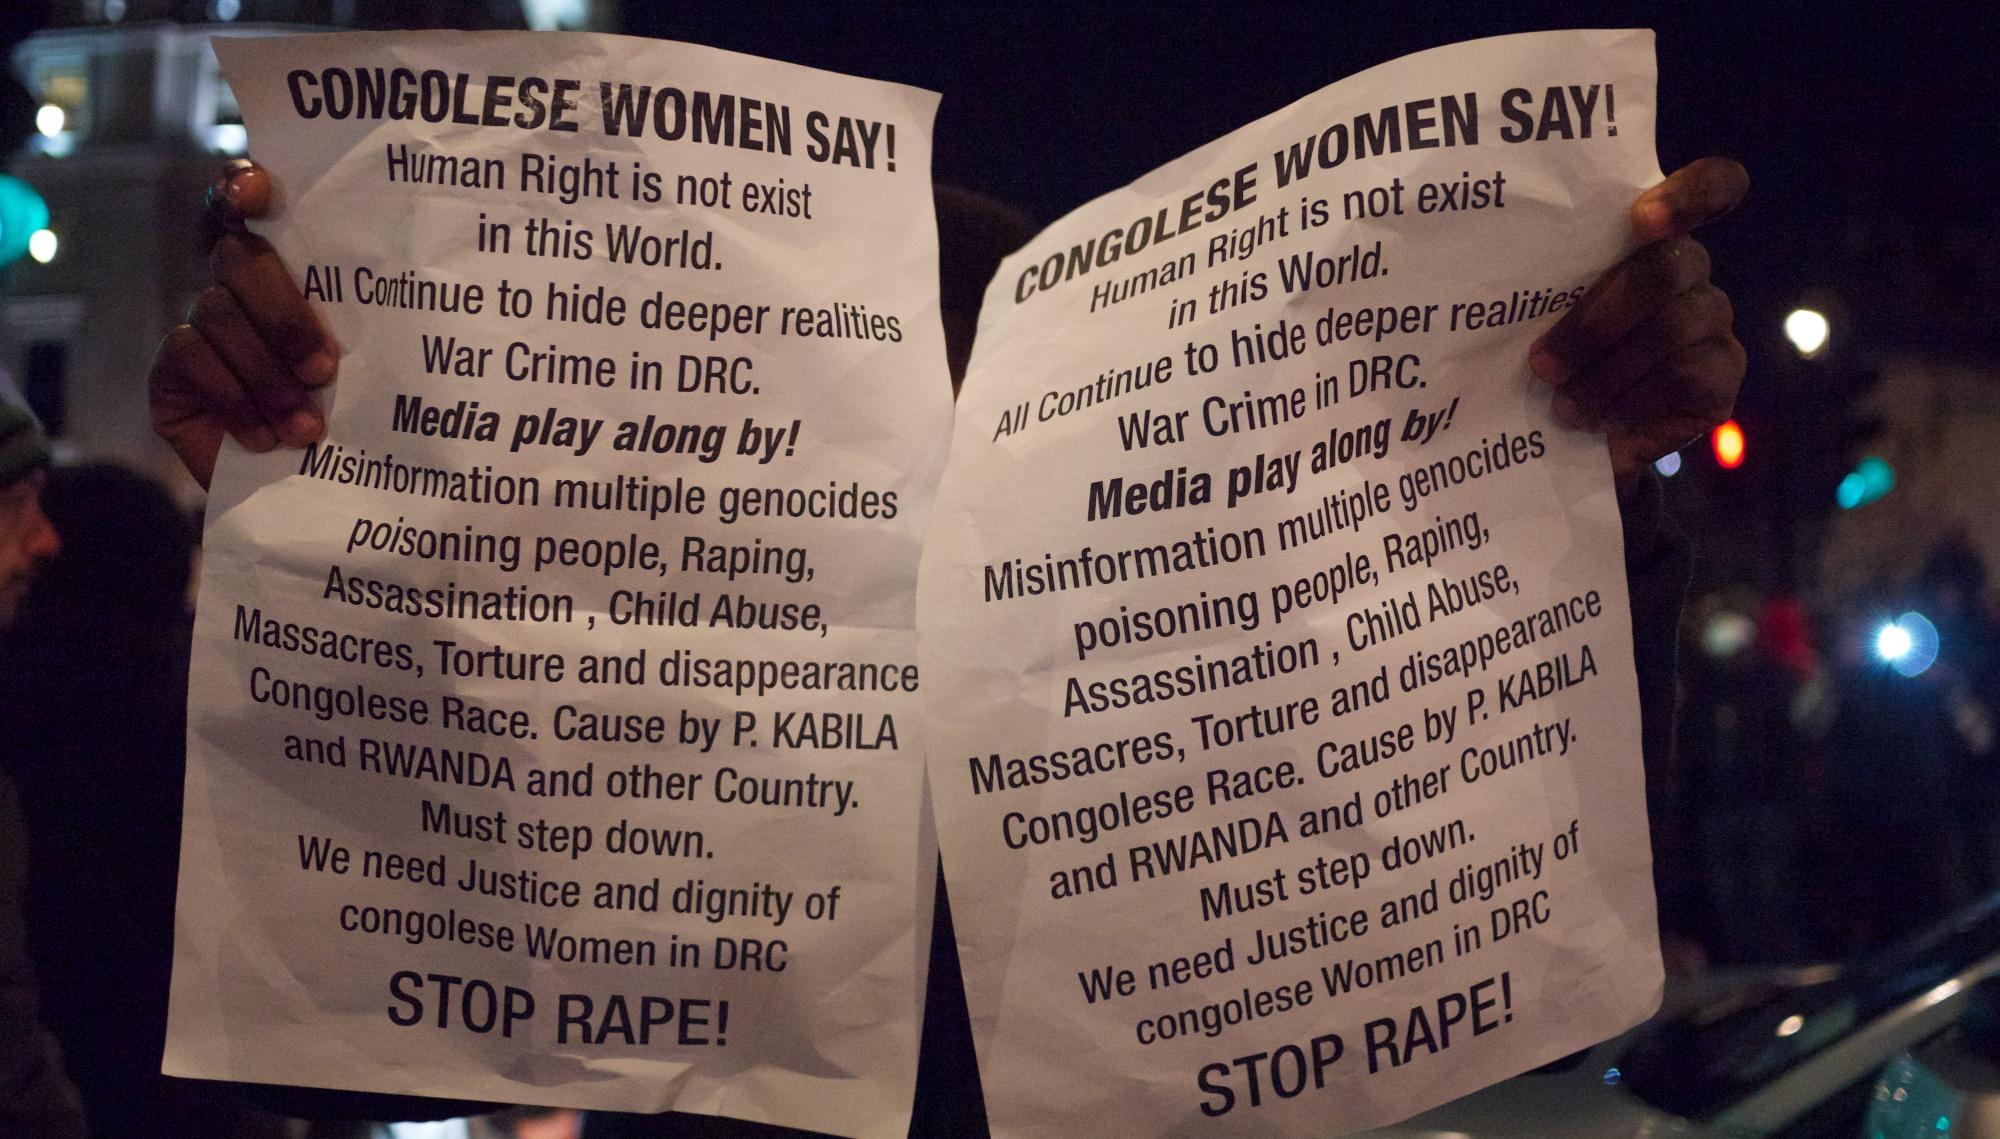 Trafalgar Square, London – Remarkable media silence on Congo protests